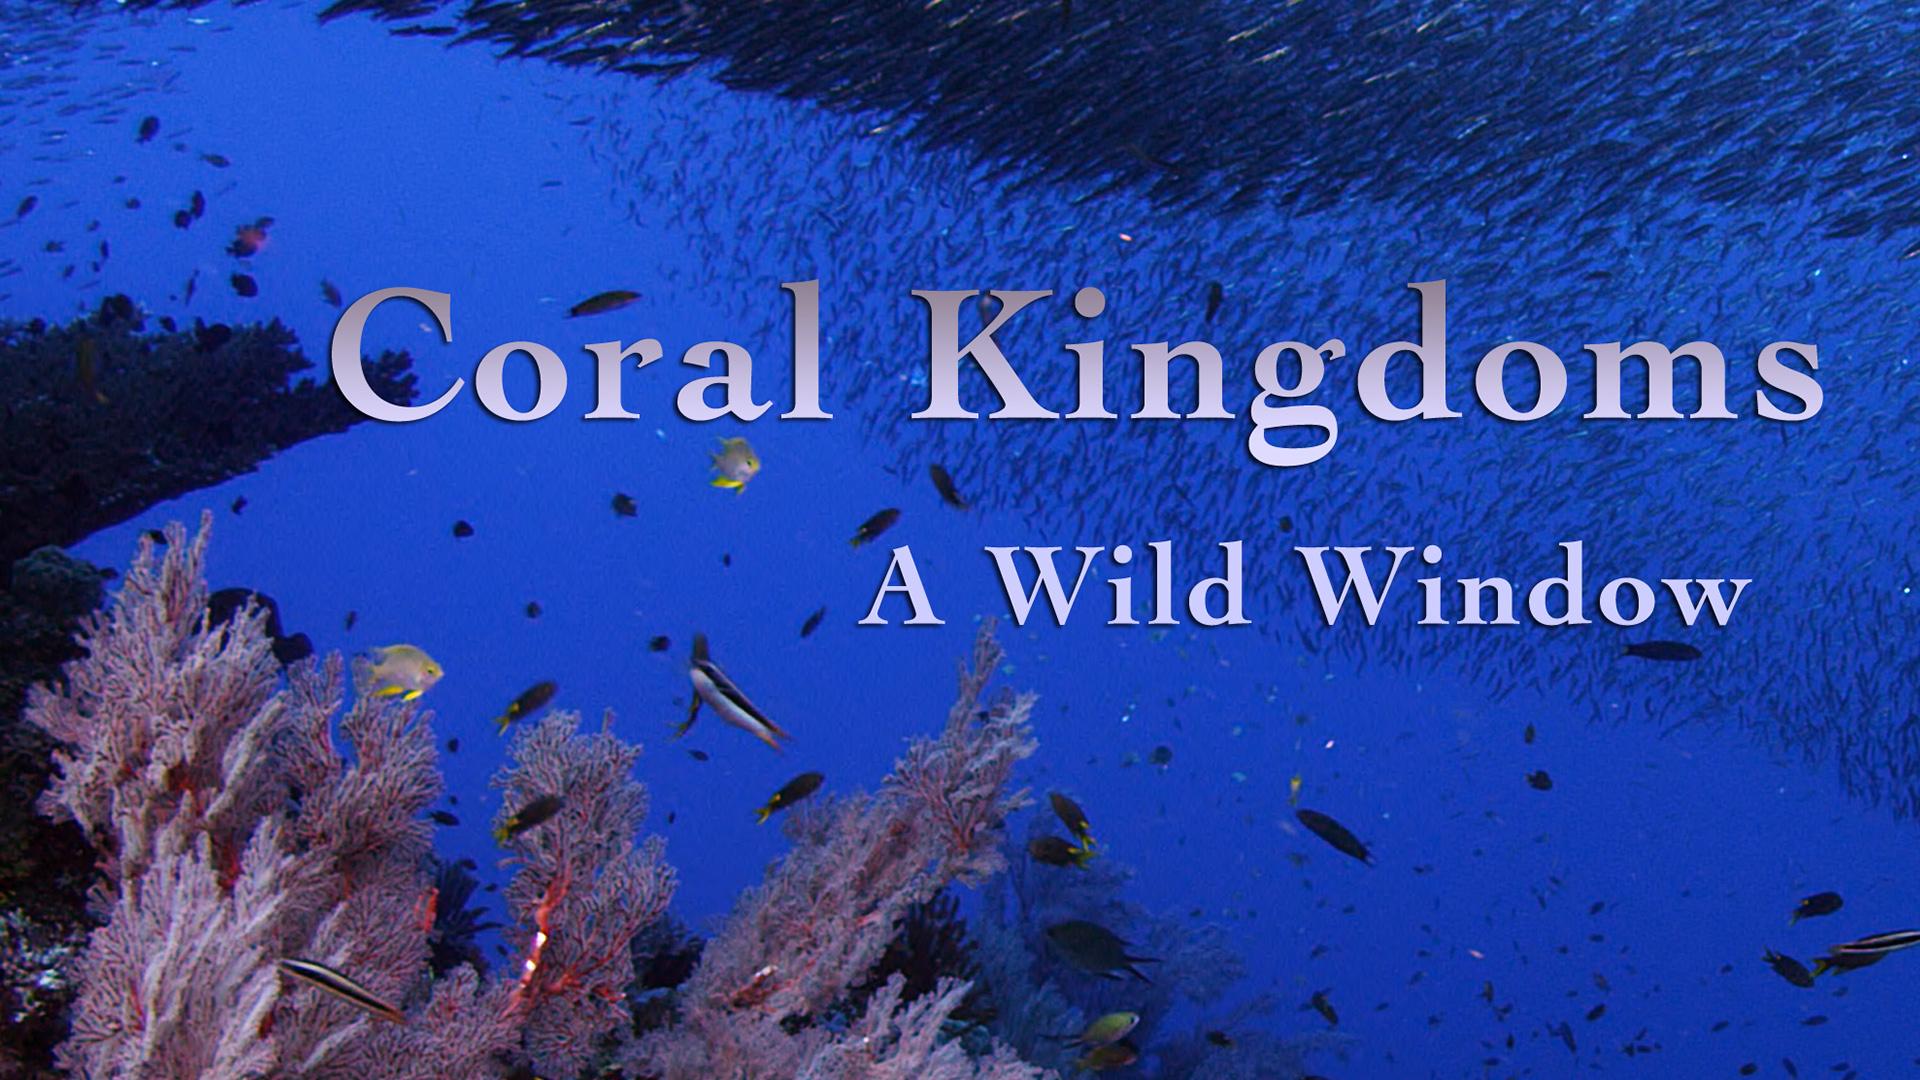 Coral Kingdoms